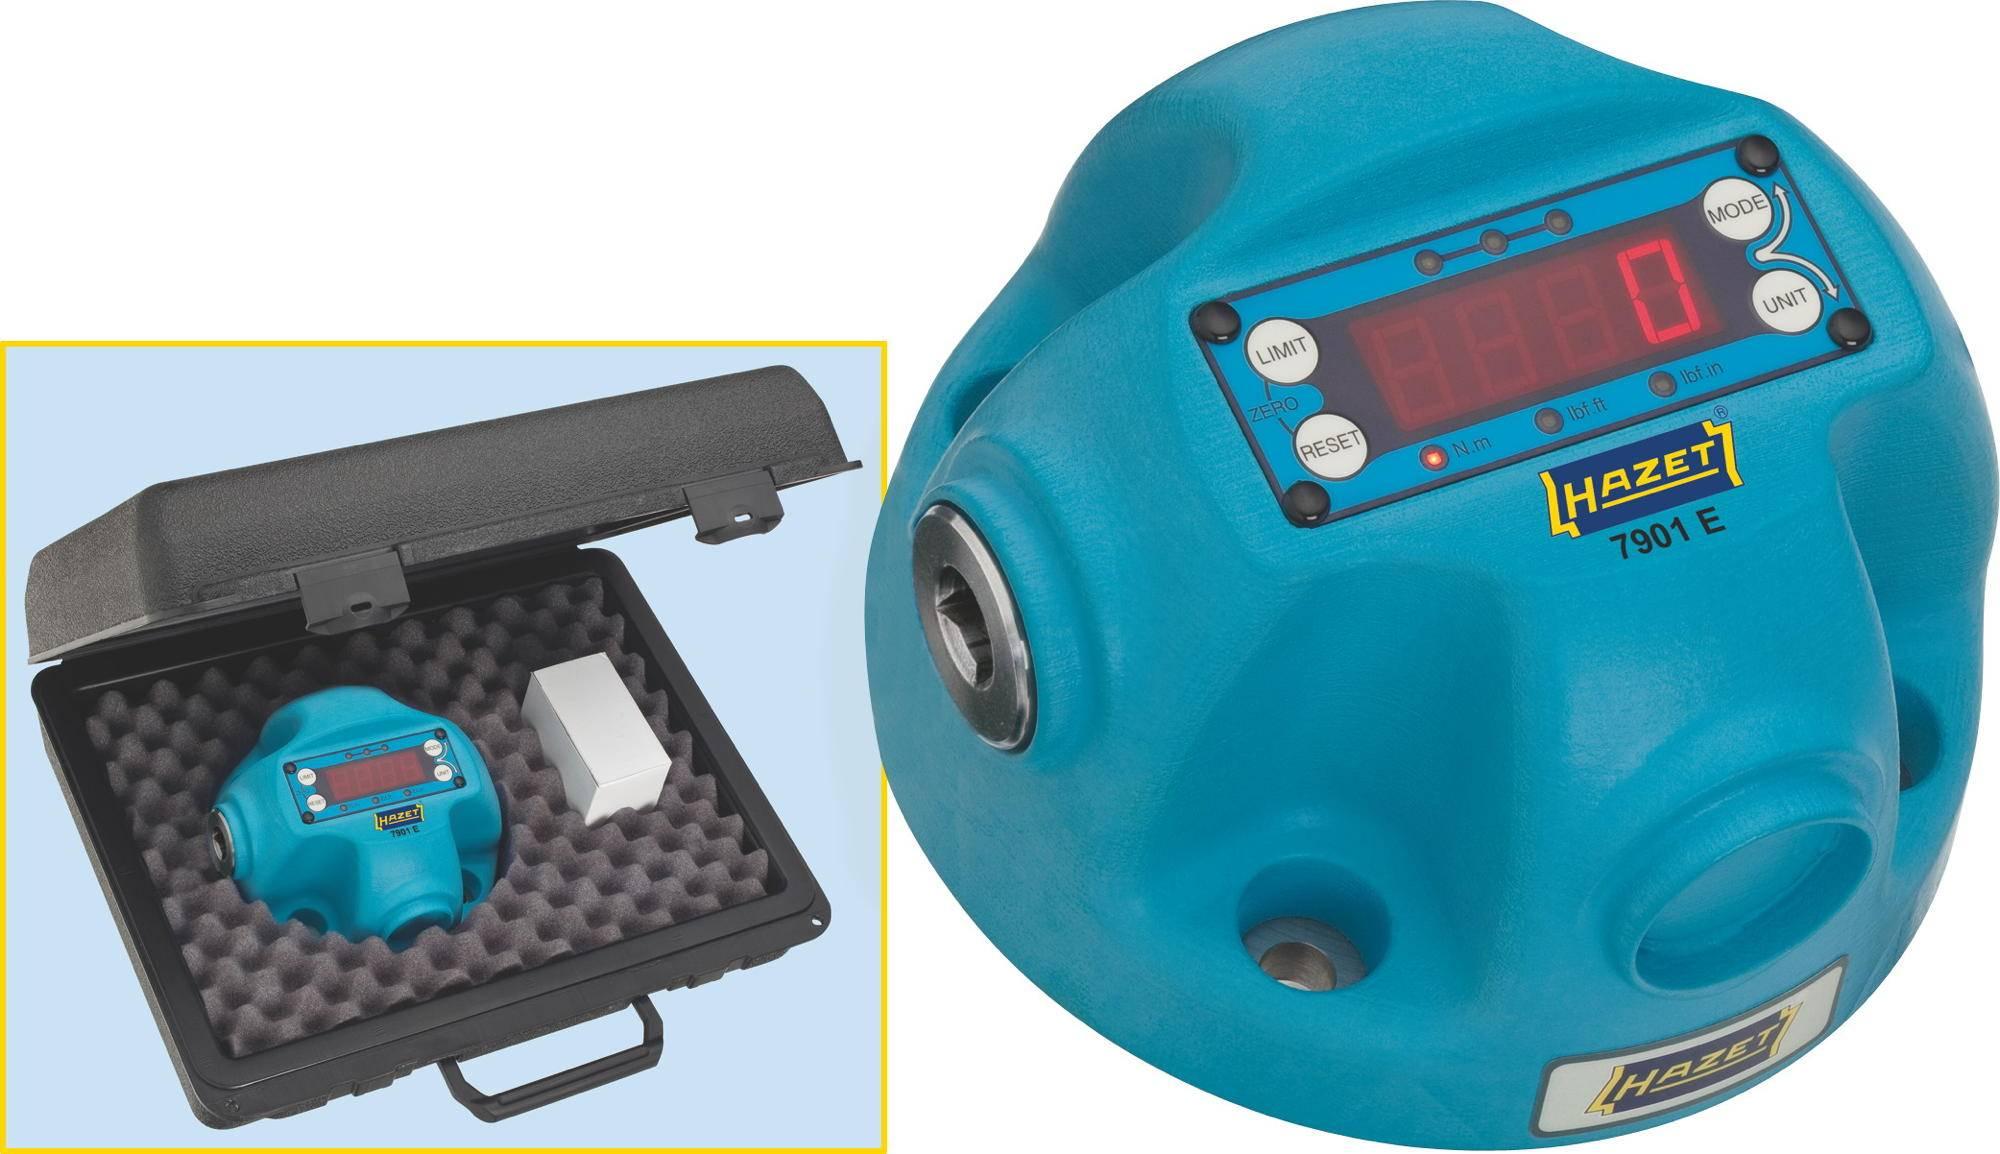 Digitální tester točivého momentu Hazet, 7901E, 10 - 350 Nm